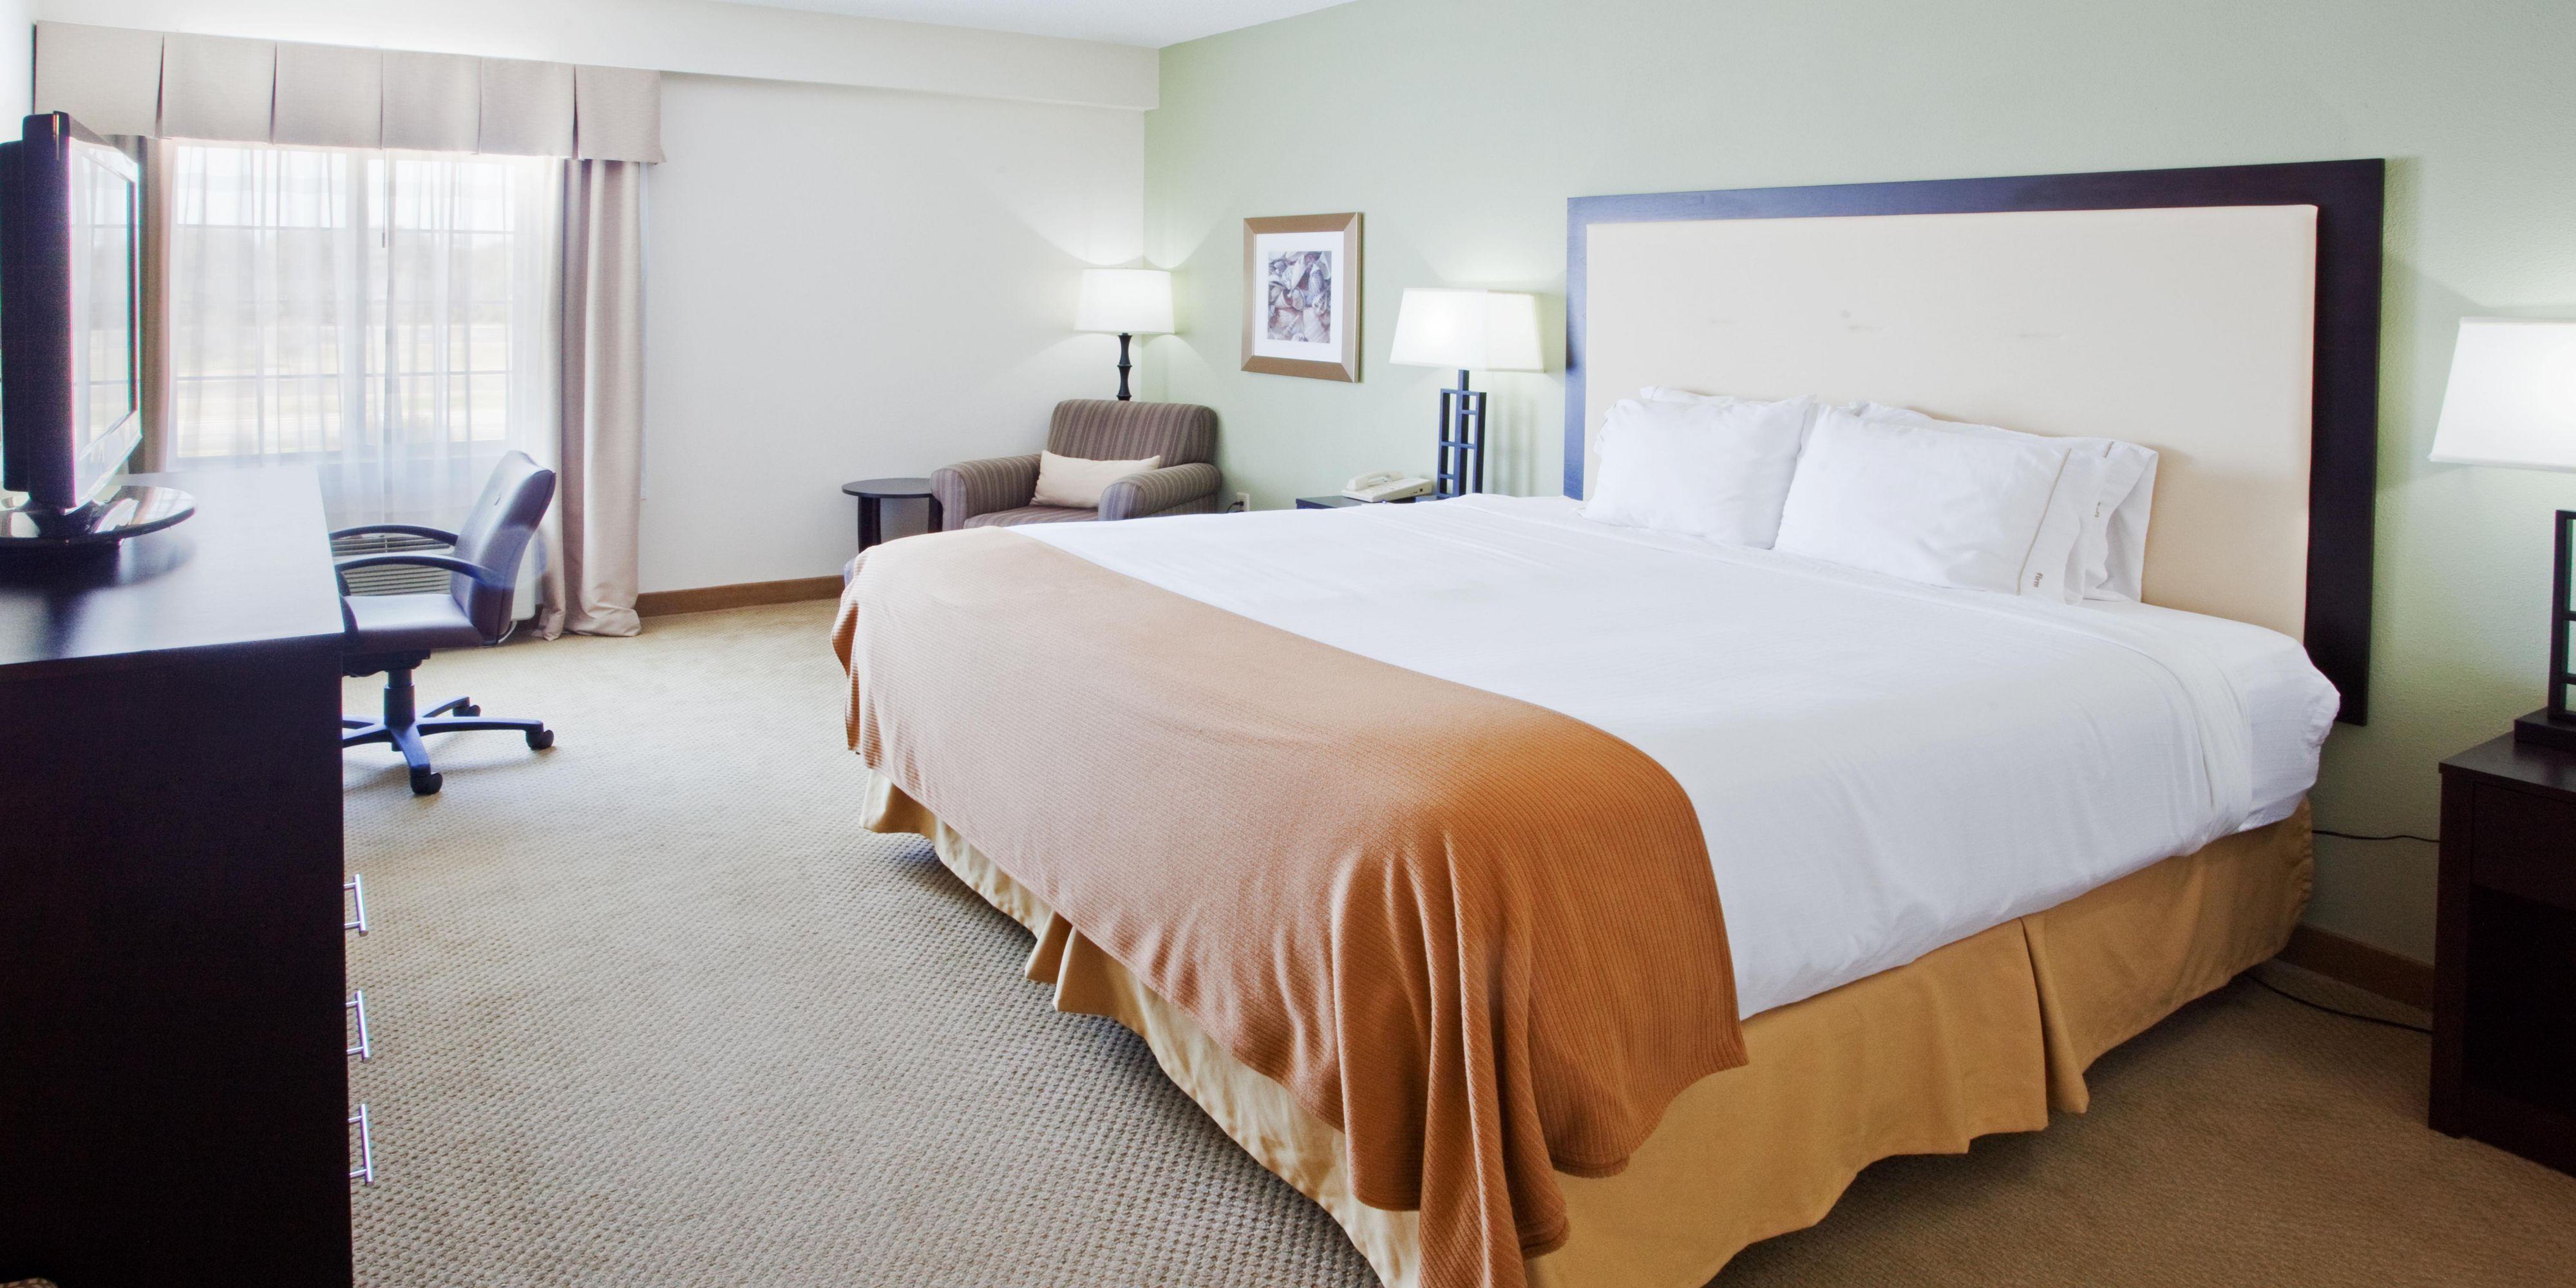 Holiday Inn Express Myrtle Beach 4286966763 2x1